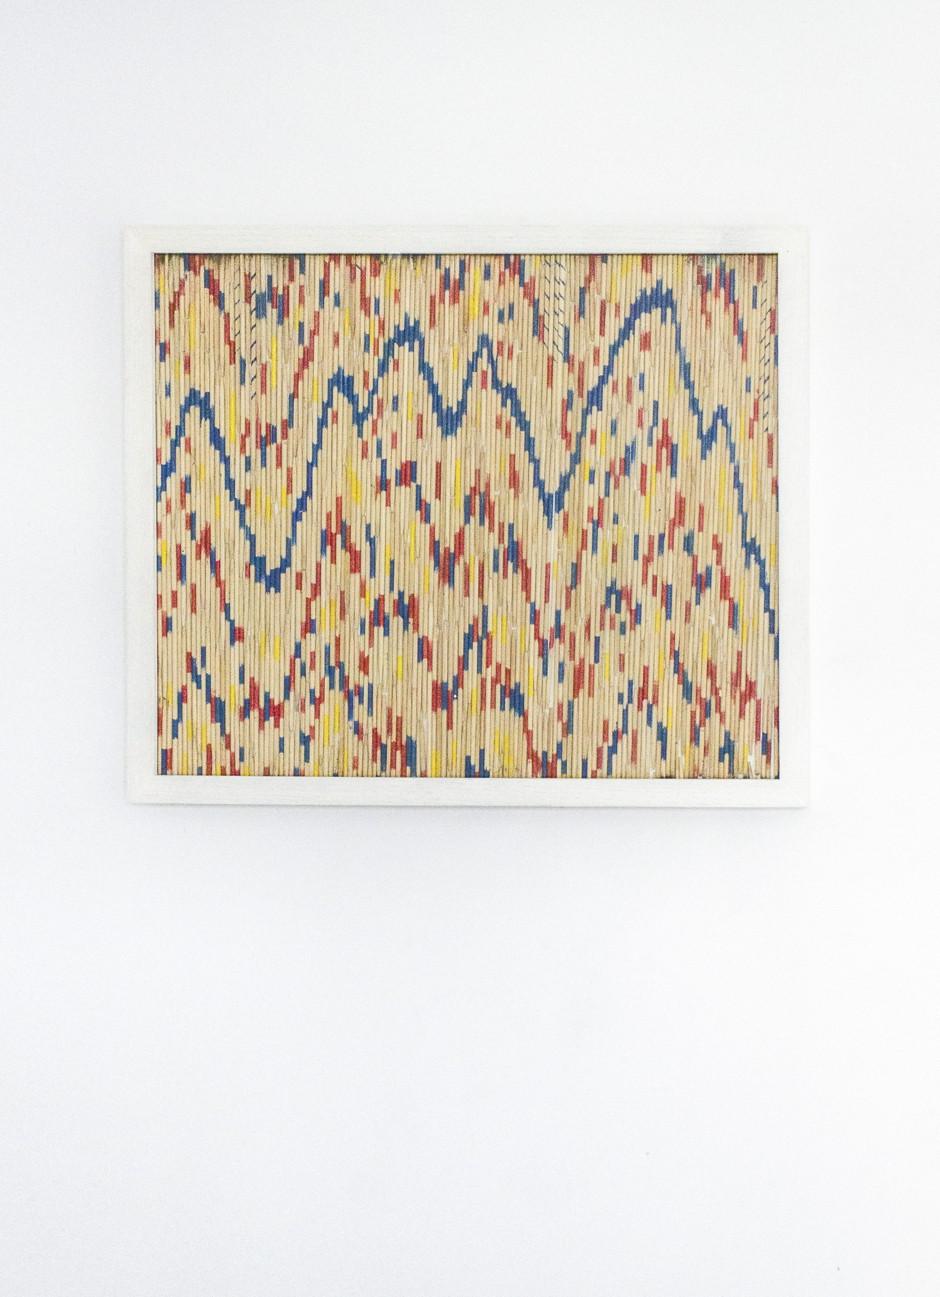 Untitled, 2020 - Toon Boeckmans